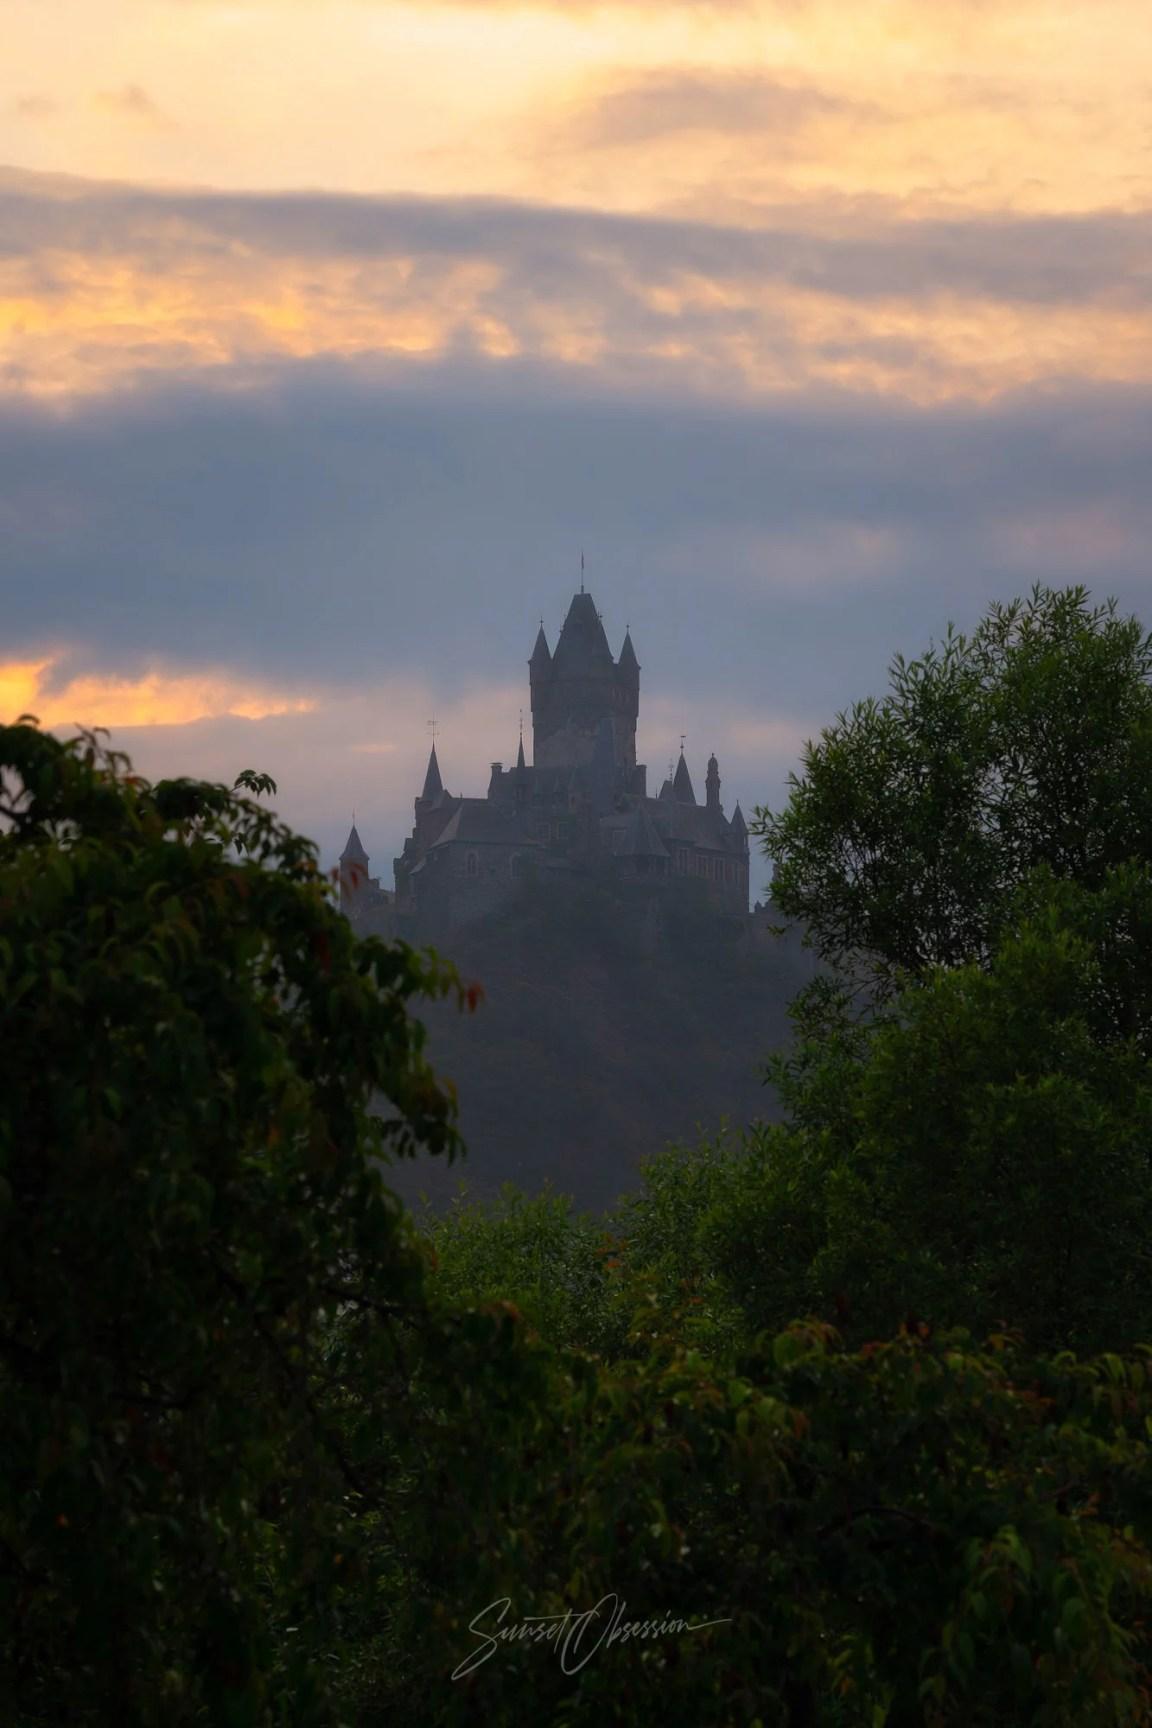 Замок Кохем на закате, Германия